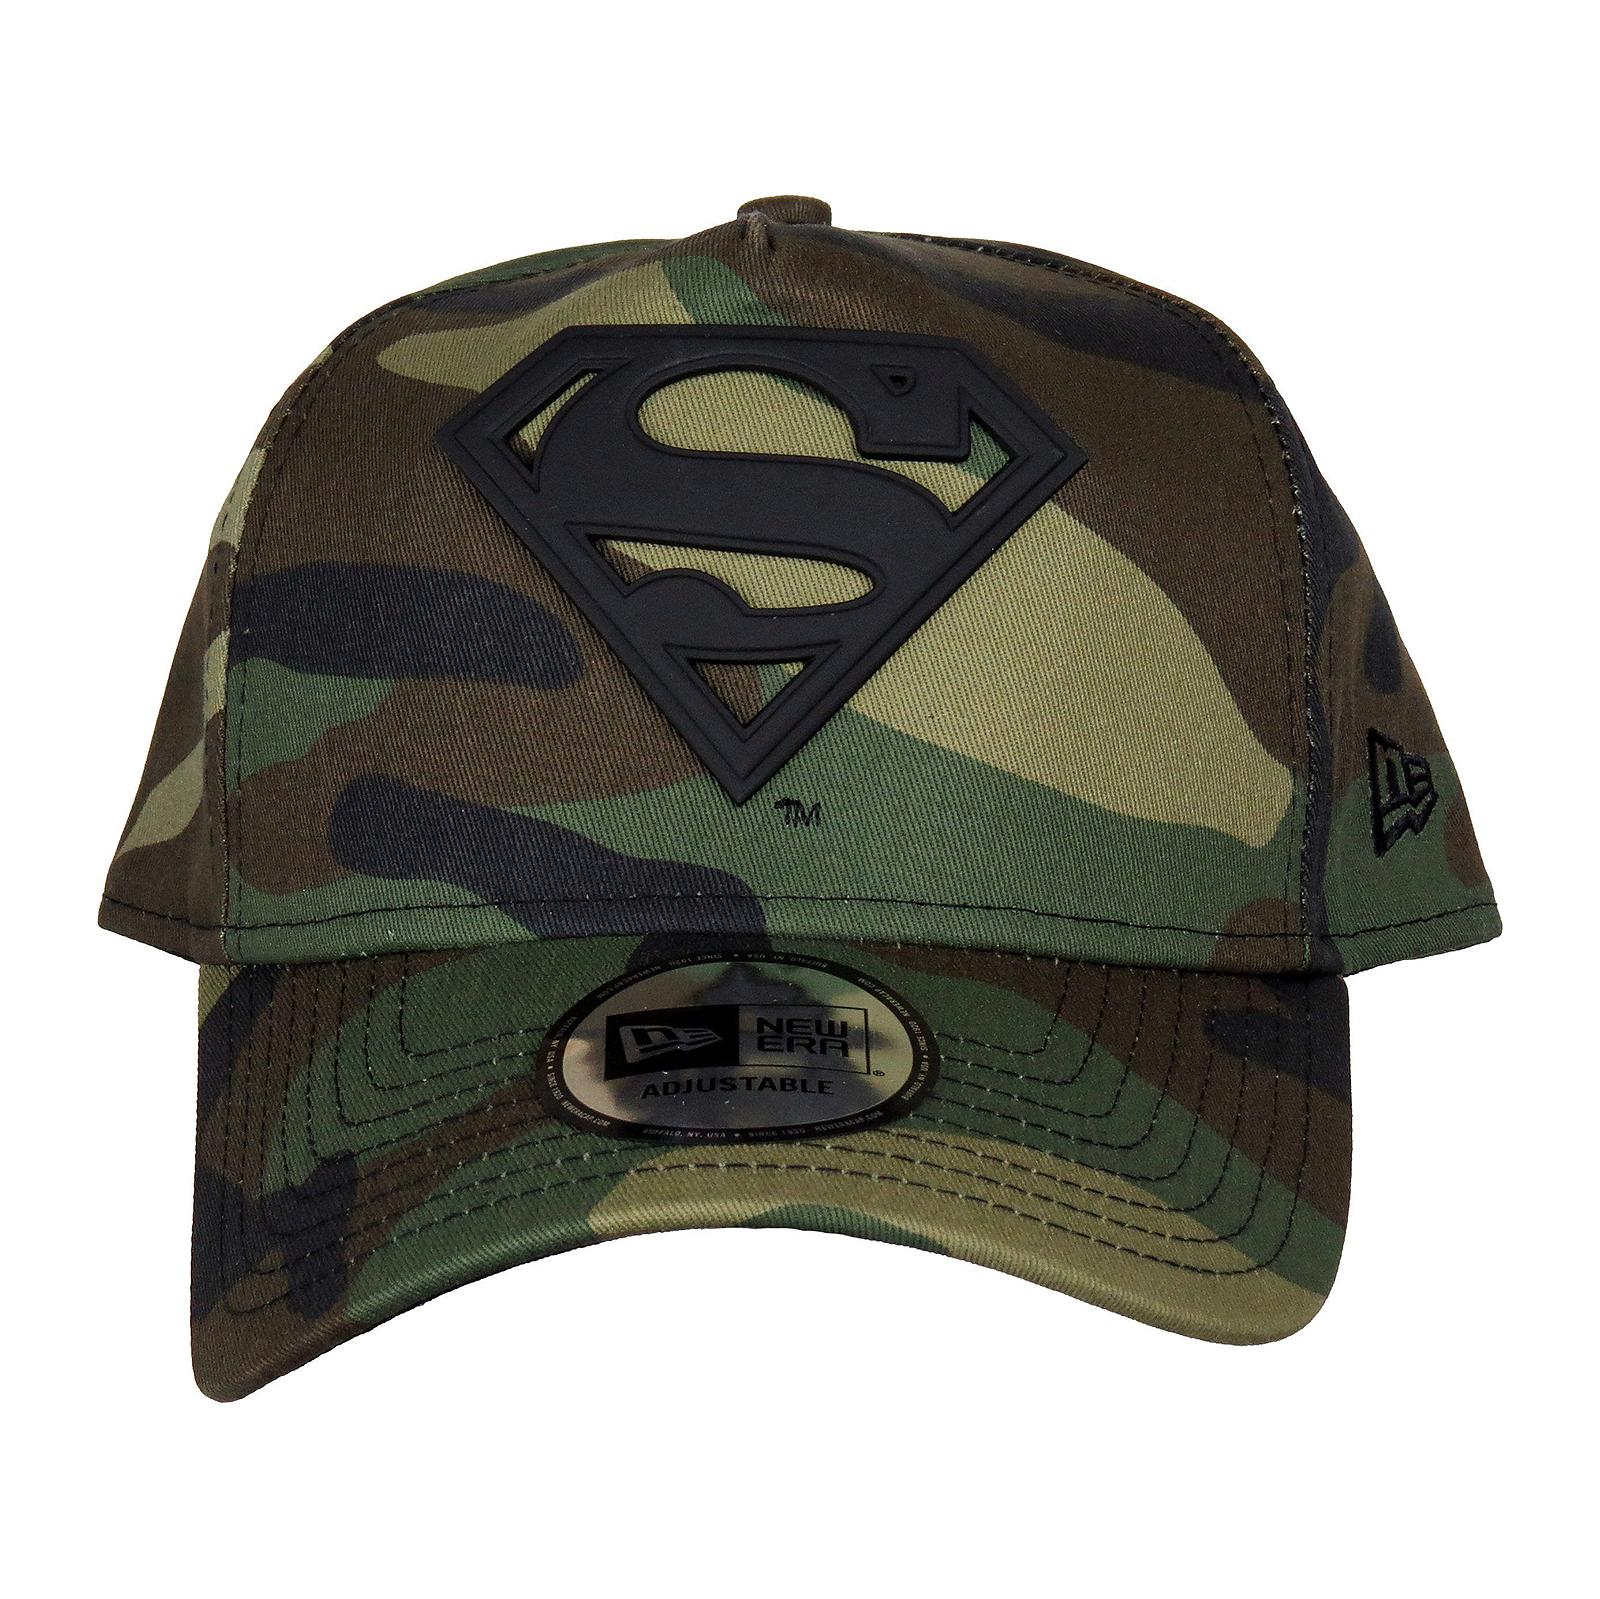 New-Era-Cappelli-Camo-Metal-Hero-A-Frame-Superman-Multicolor